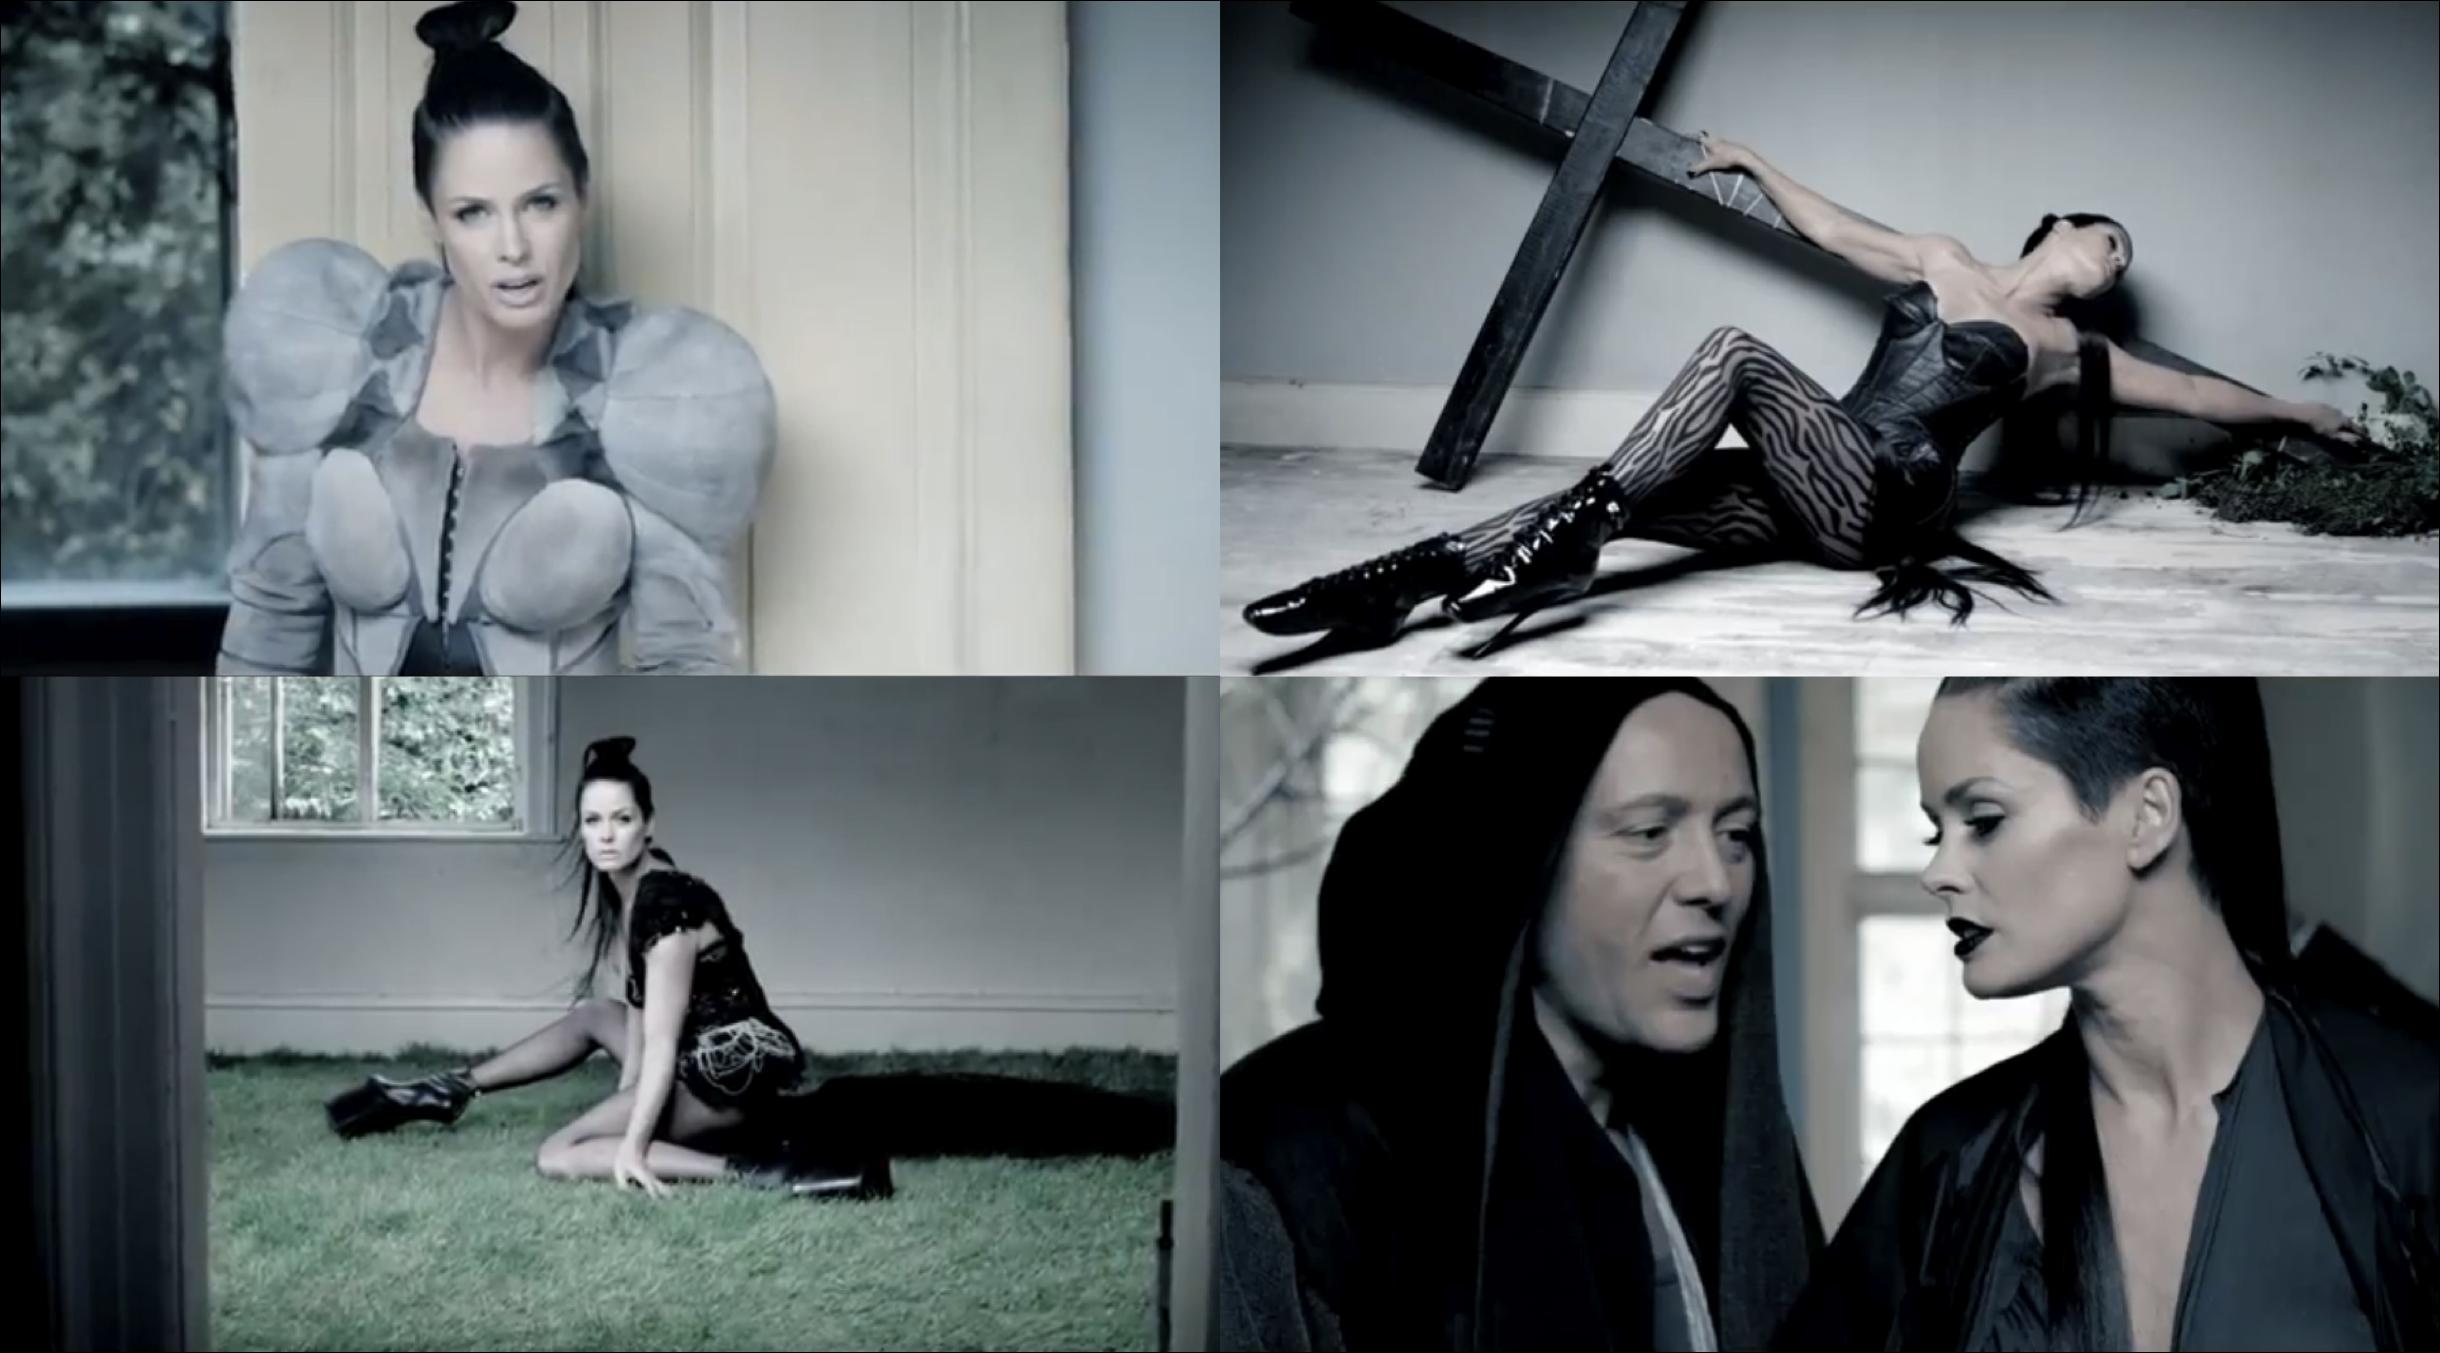 http //feedlimmy.files.wordpress.com/2011/09/aqua-playmate-to-jesus-music-video.png m0ayTZi7Xjw